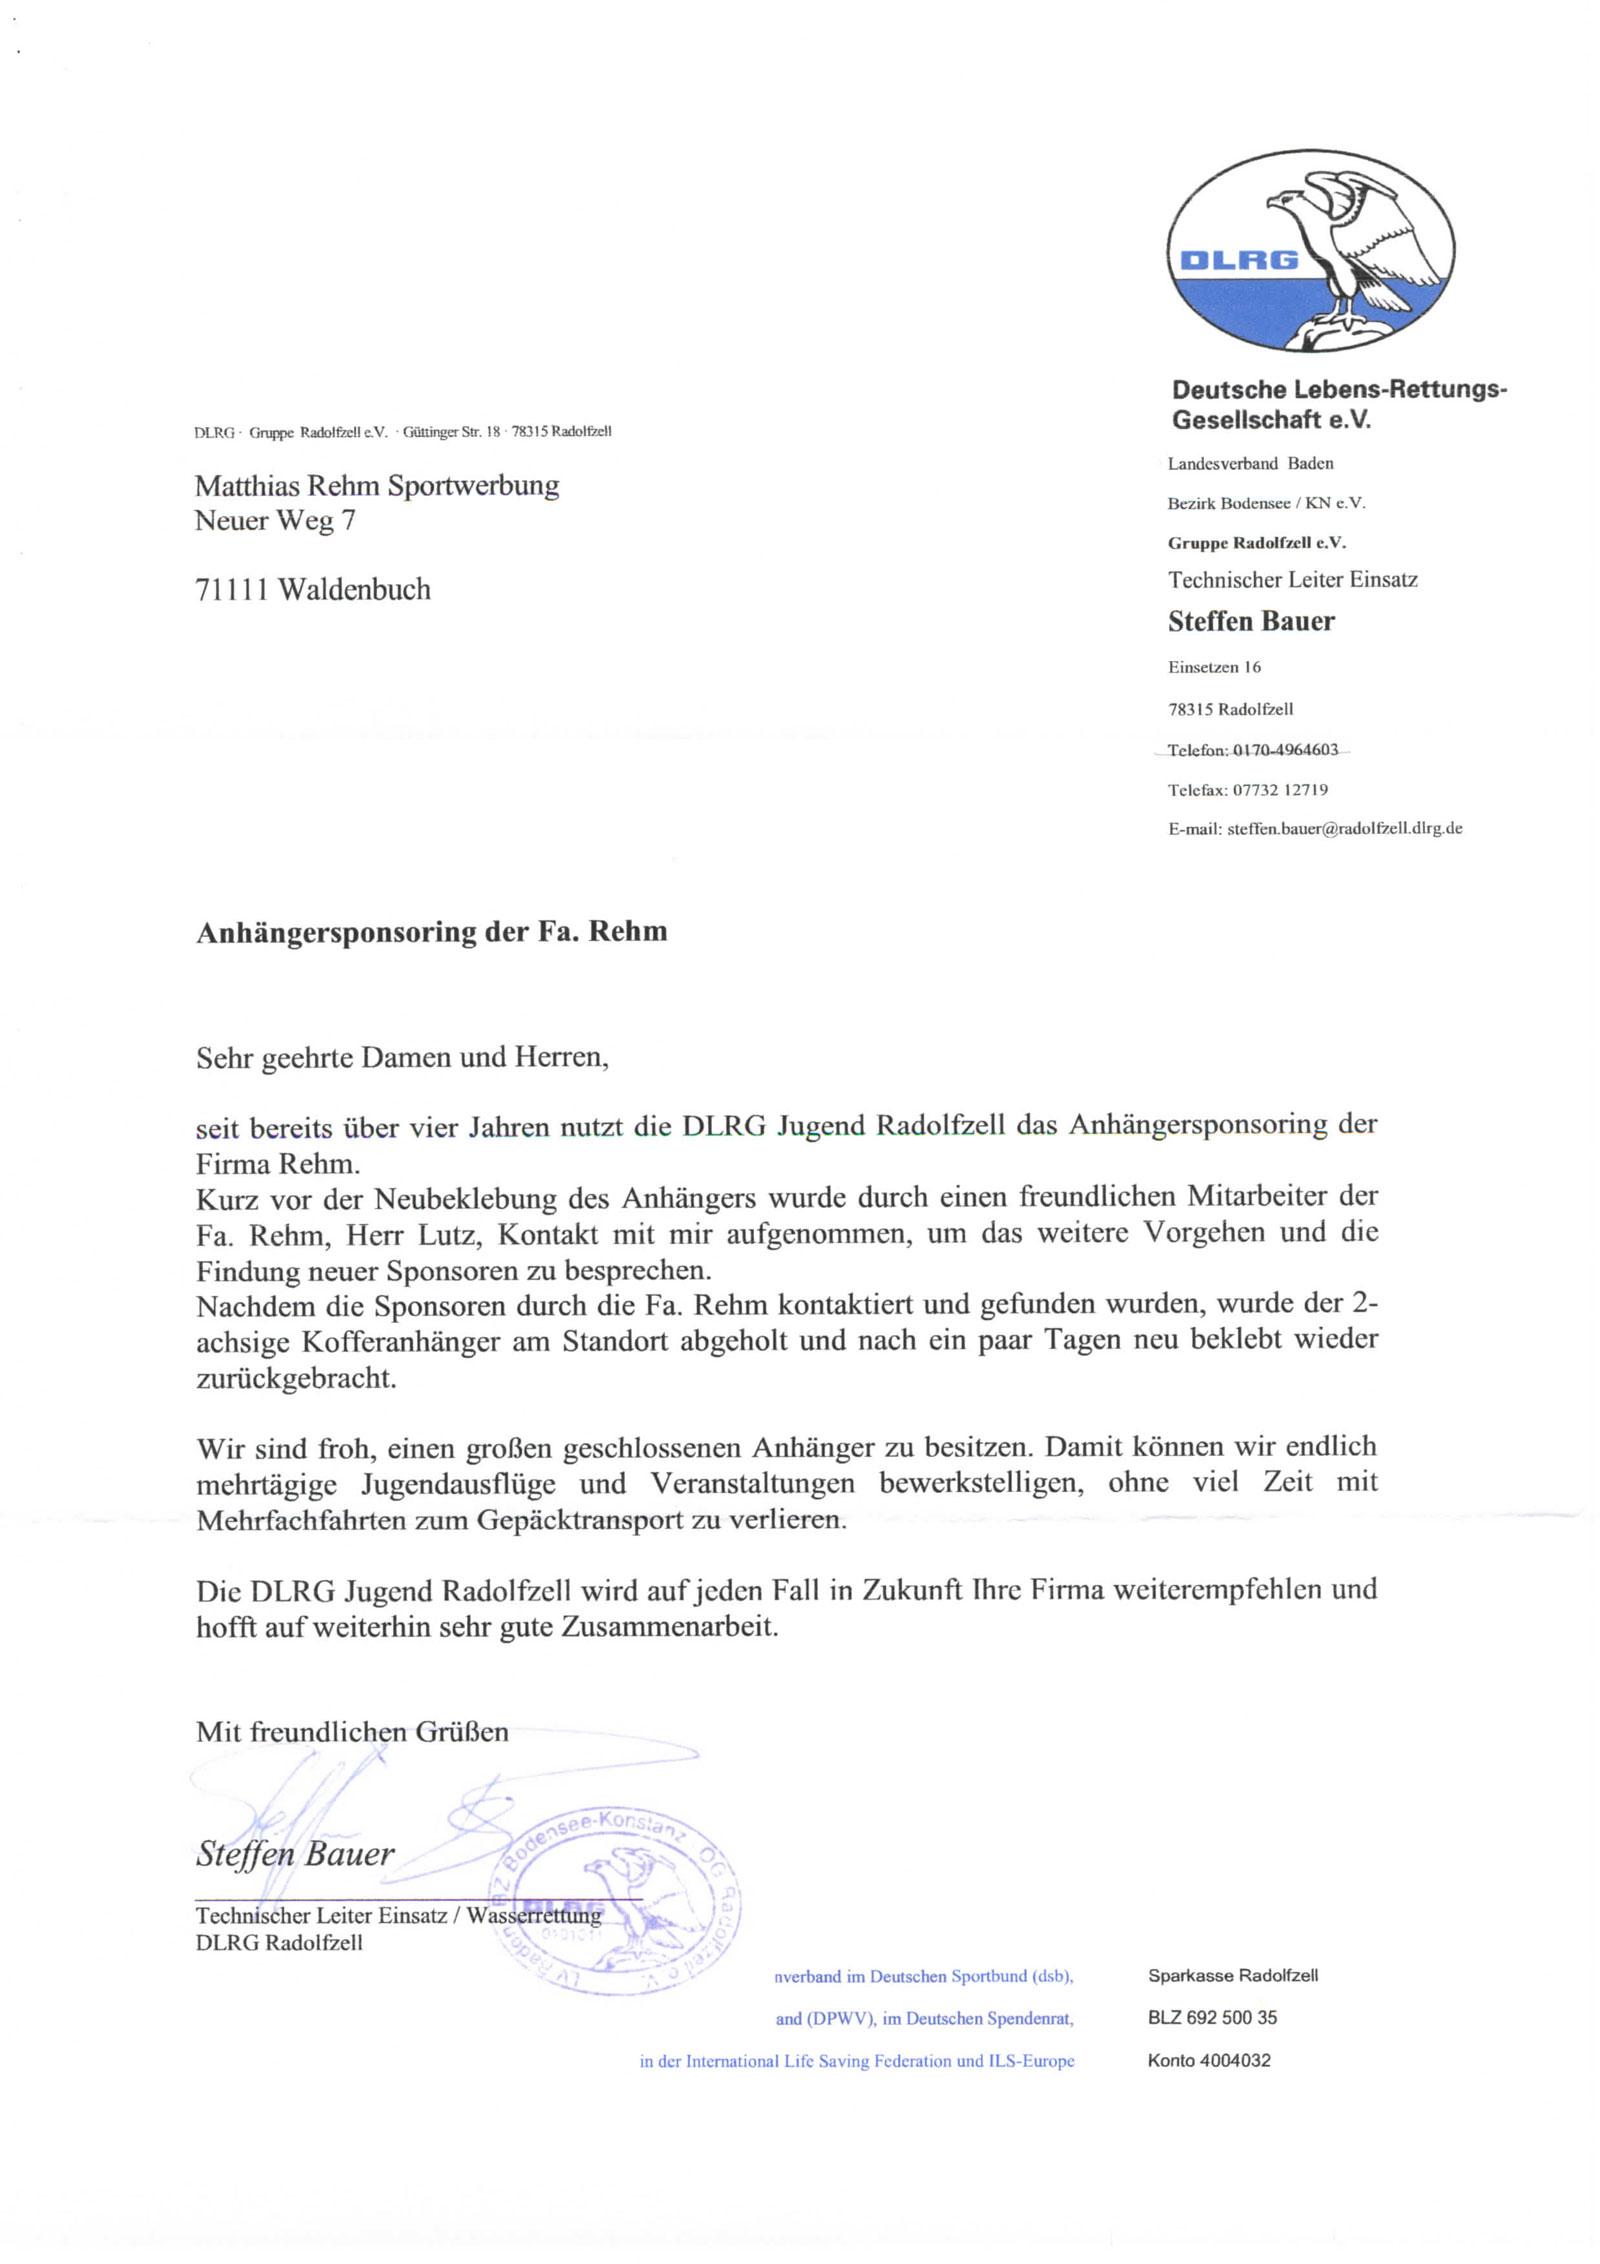 Rehm Sportwerbung | Referenz DLRG Radolfzell